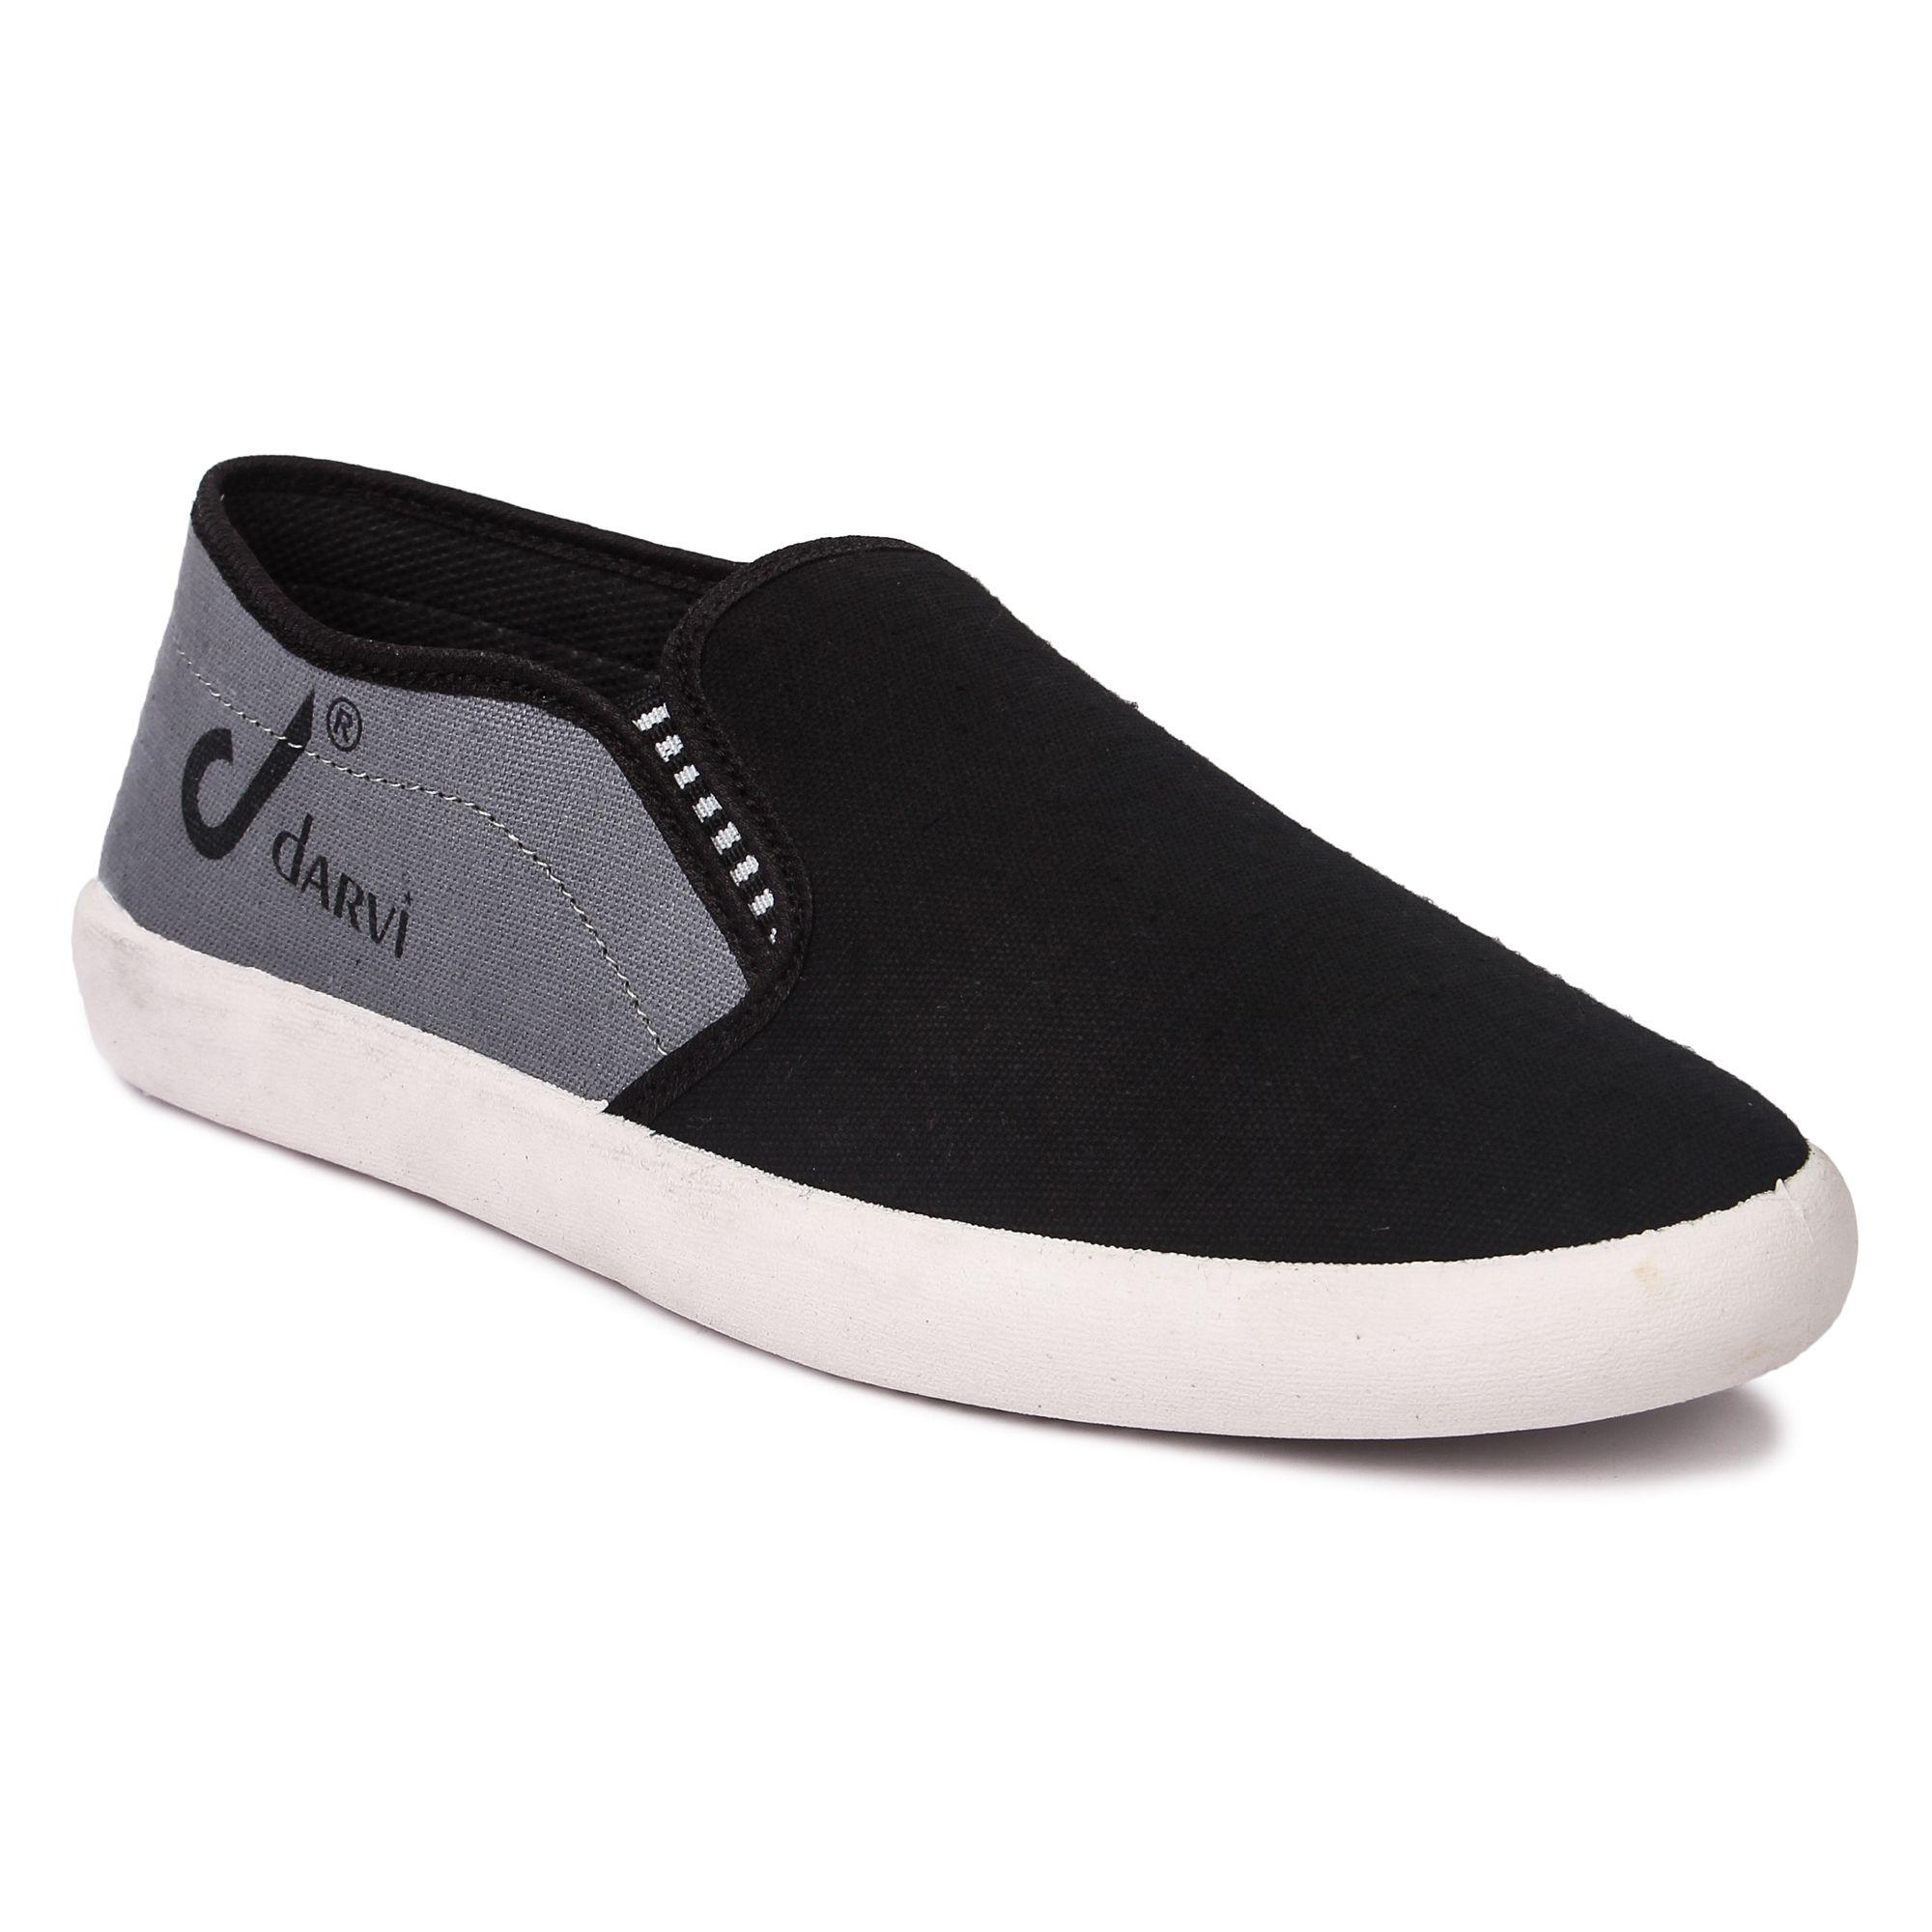 8682b8dd5a2 Czar Darvi Men s Casual Loafers Shoes Black Casual Shoes - Buy Czar ...